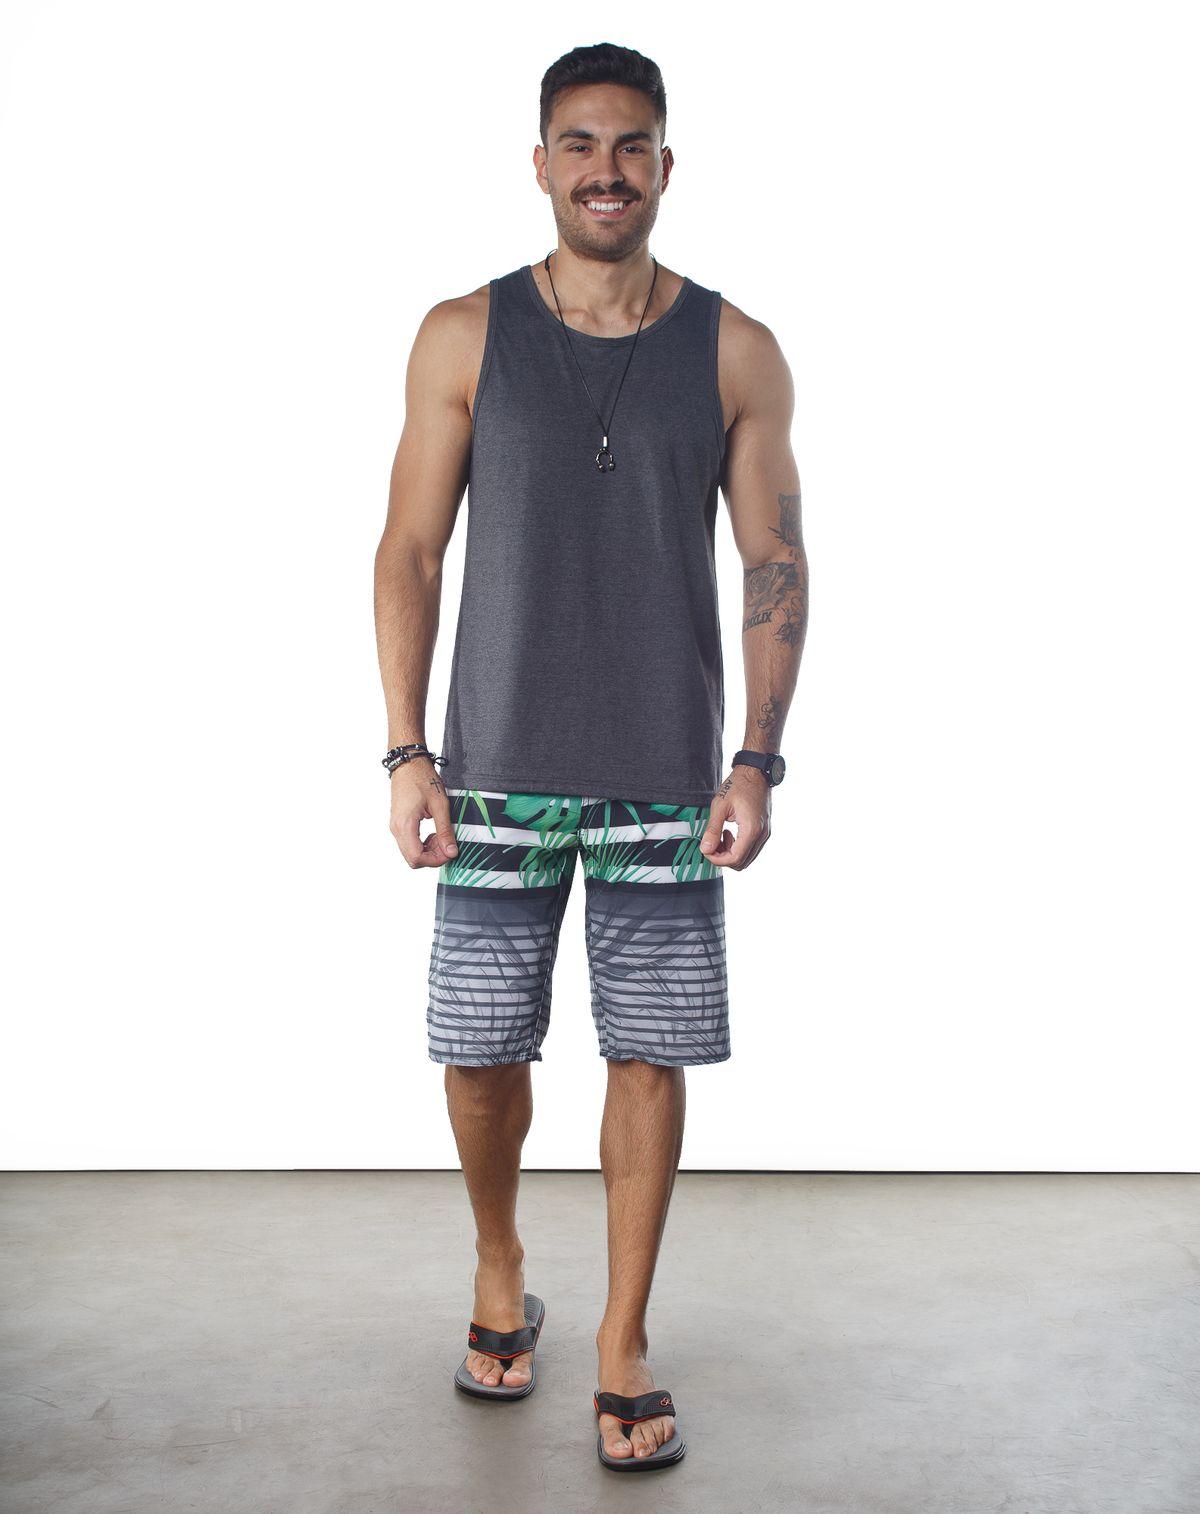 560345001-bermuda-surf-masculina-estampa-folhas-verde-cza-36-264